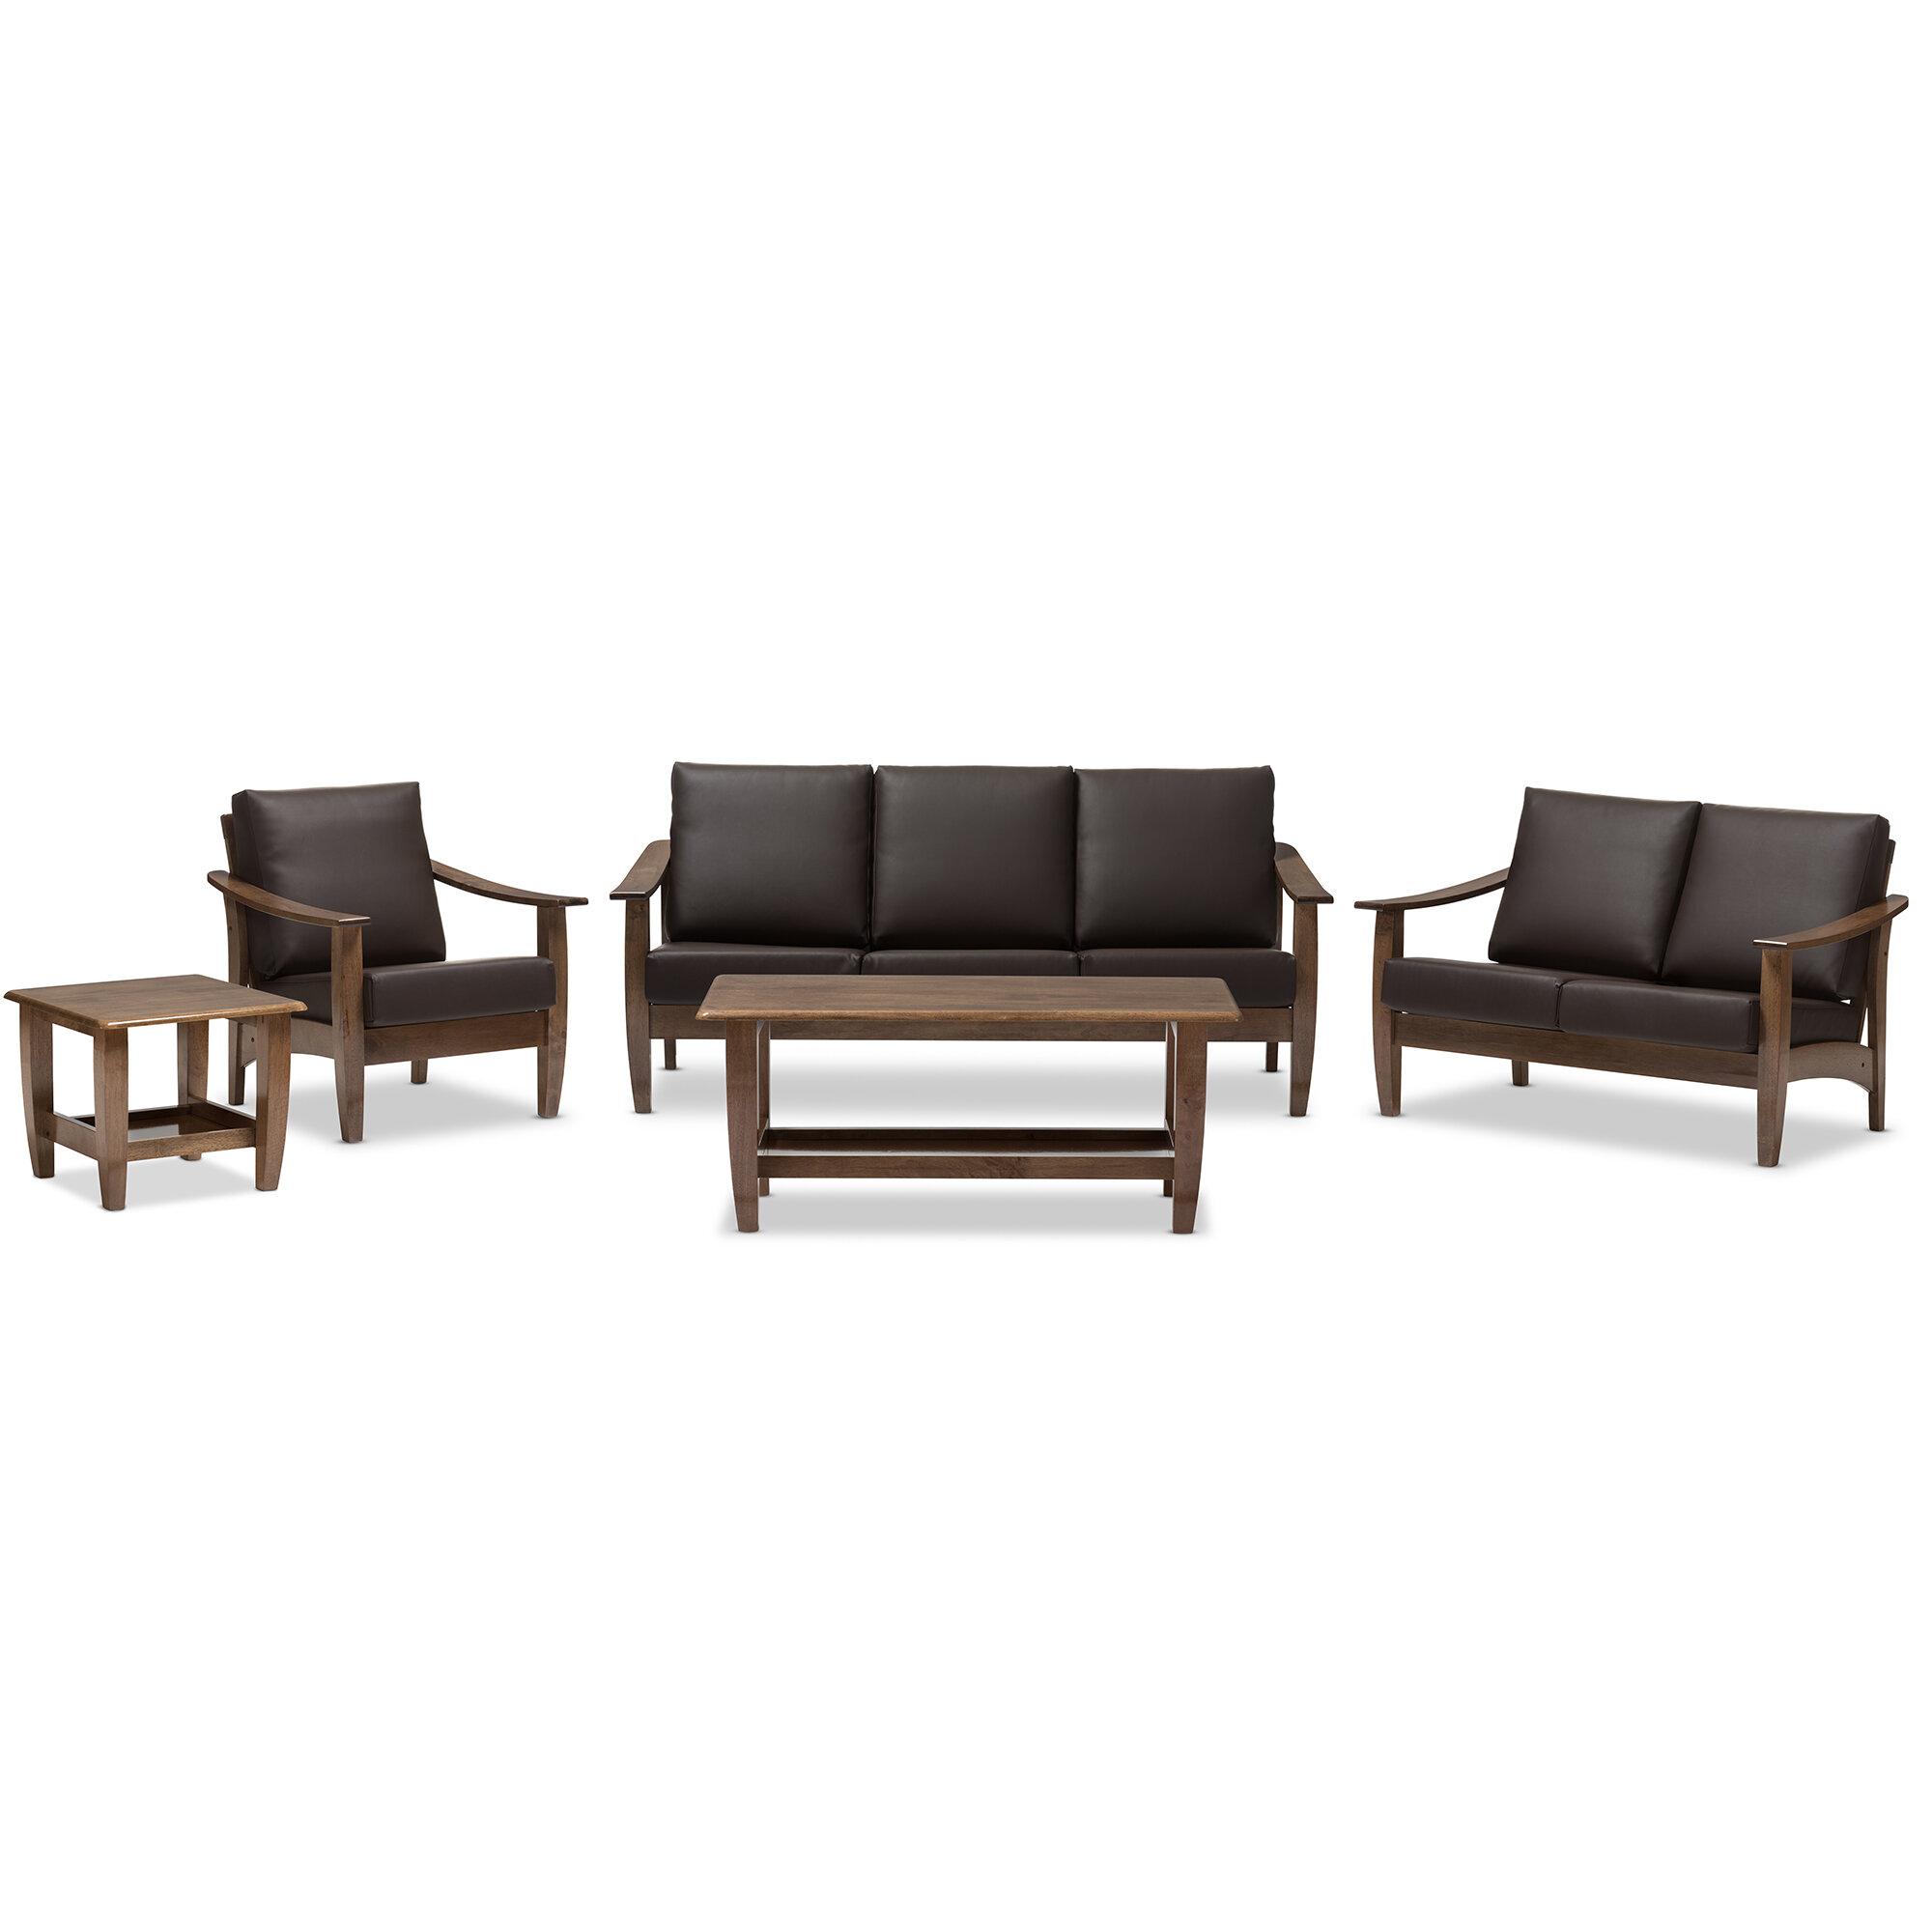 Latitude Run Ahart 5 Piece Living Room Set | Wayfair